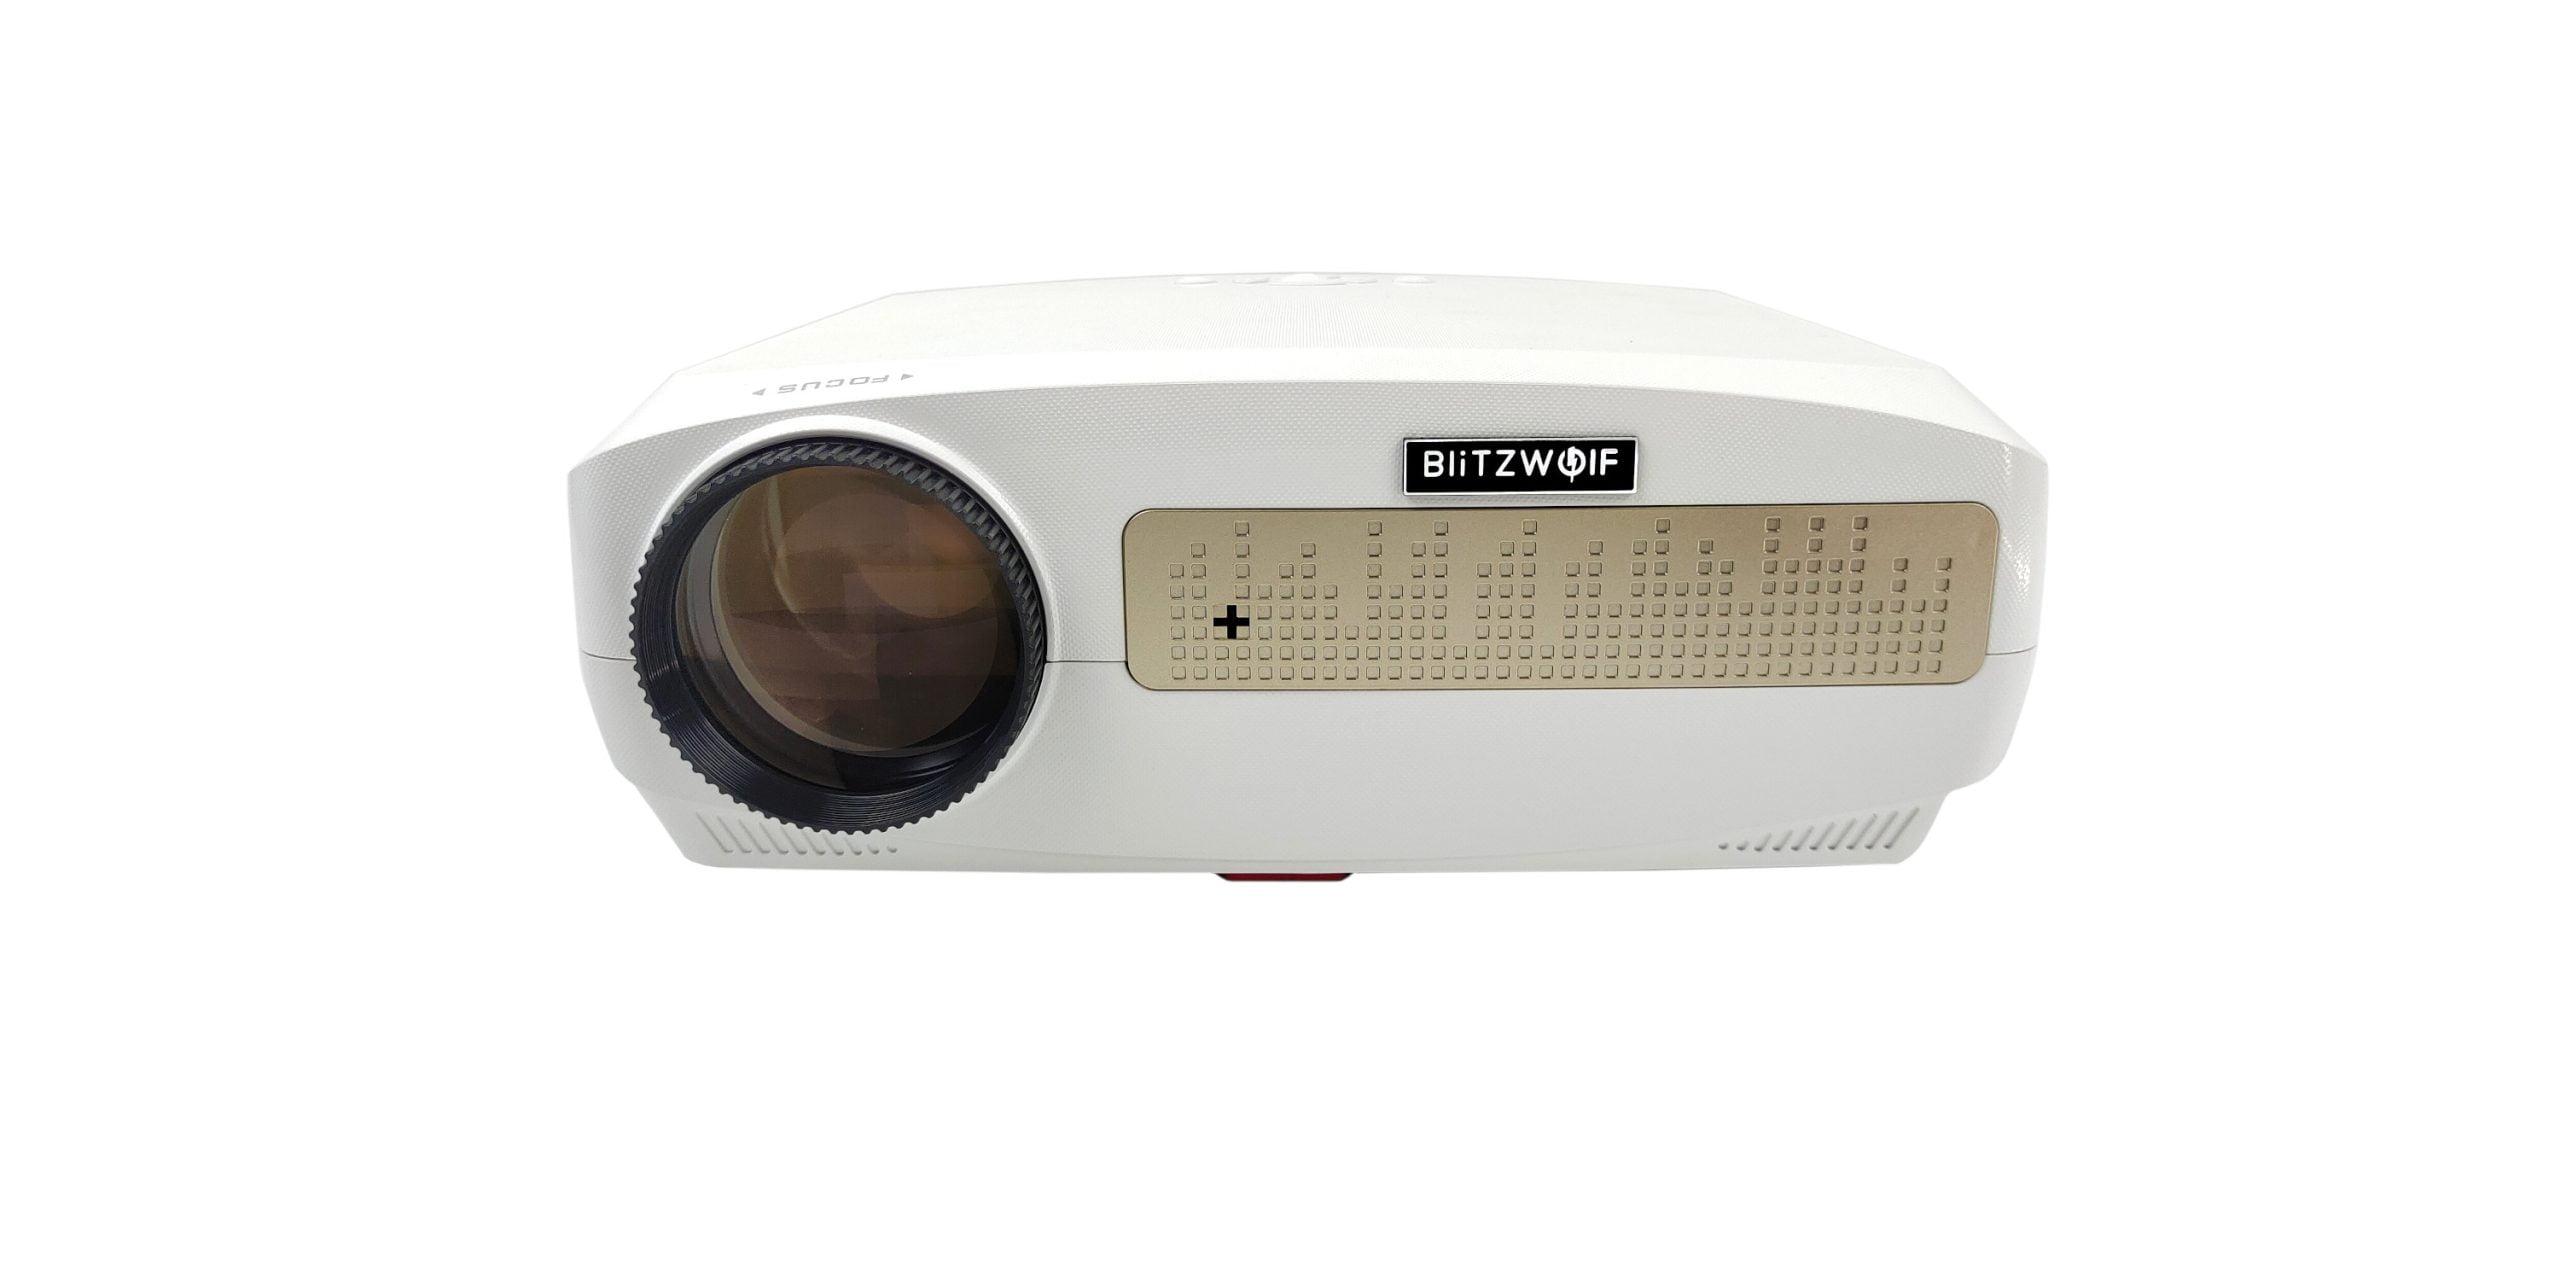 Przegląd raportu z testu projektora projektora BlitzWolf BW-VP9